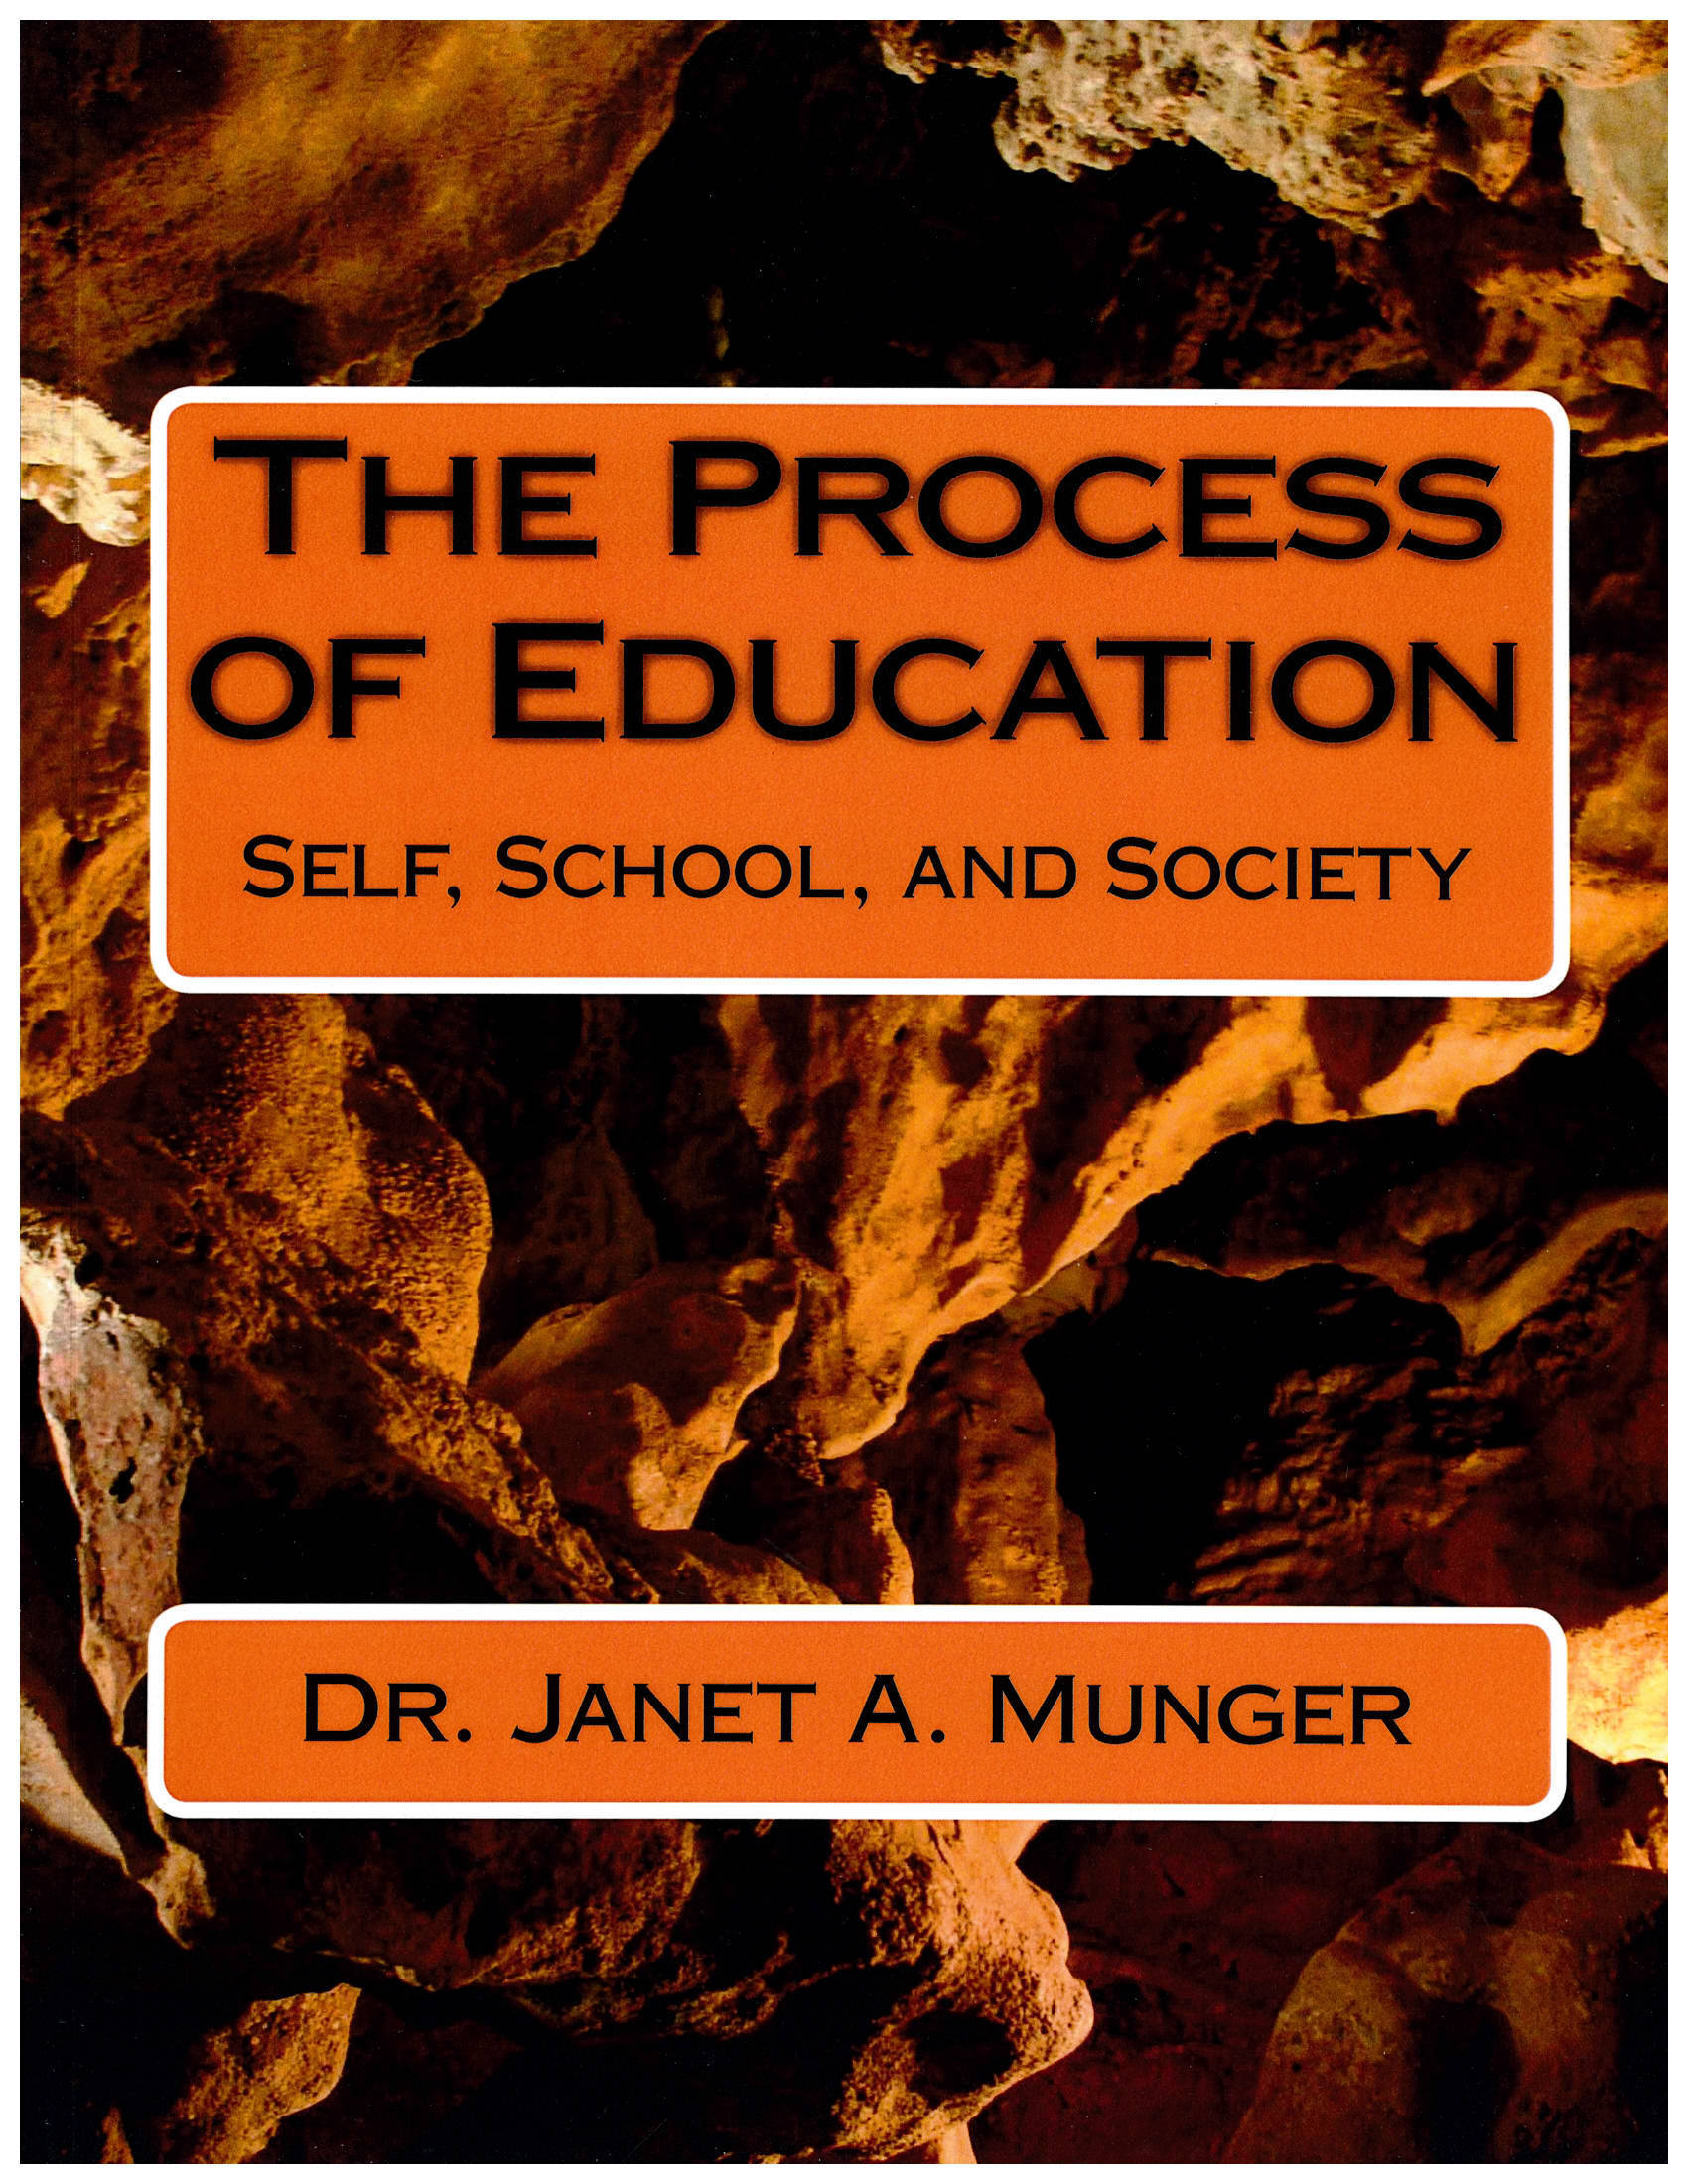 0a0841b333a29a09e68b_Facebook_JPG_The_Process_of_Education_01-17-17.jpg